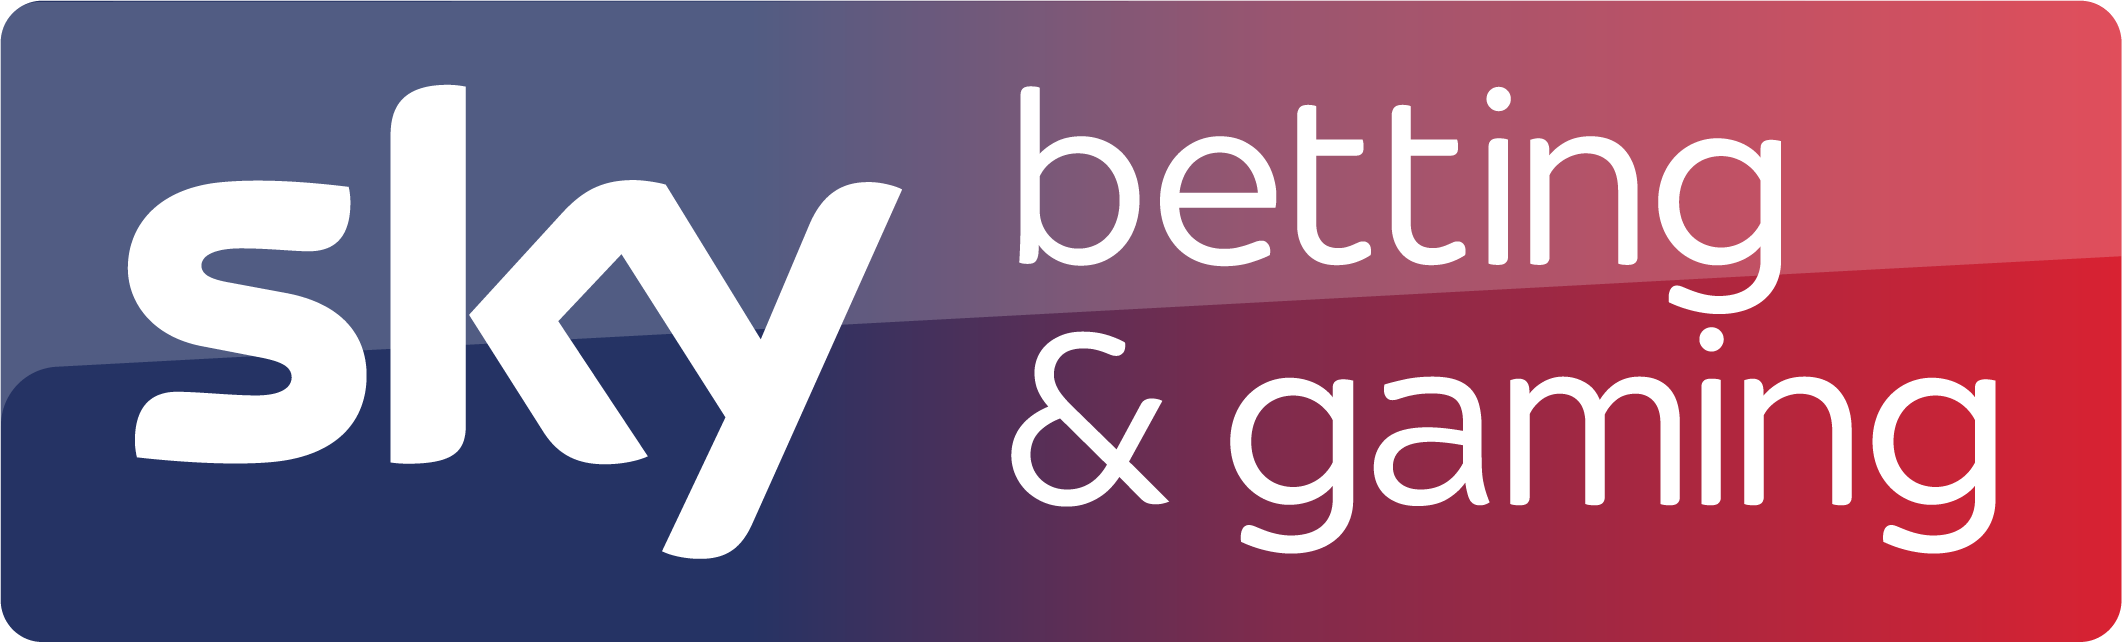 sky-bet-careers-logo